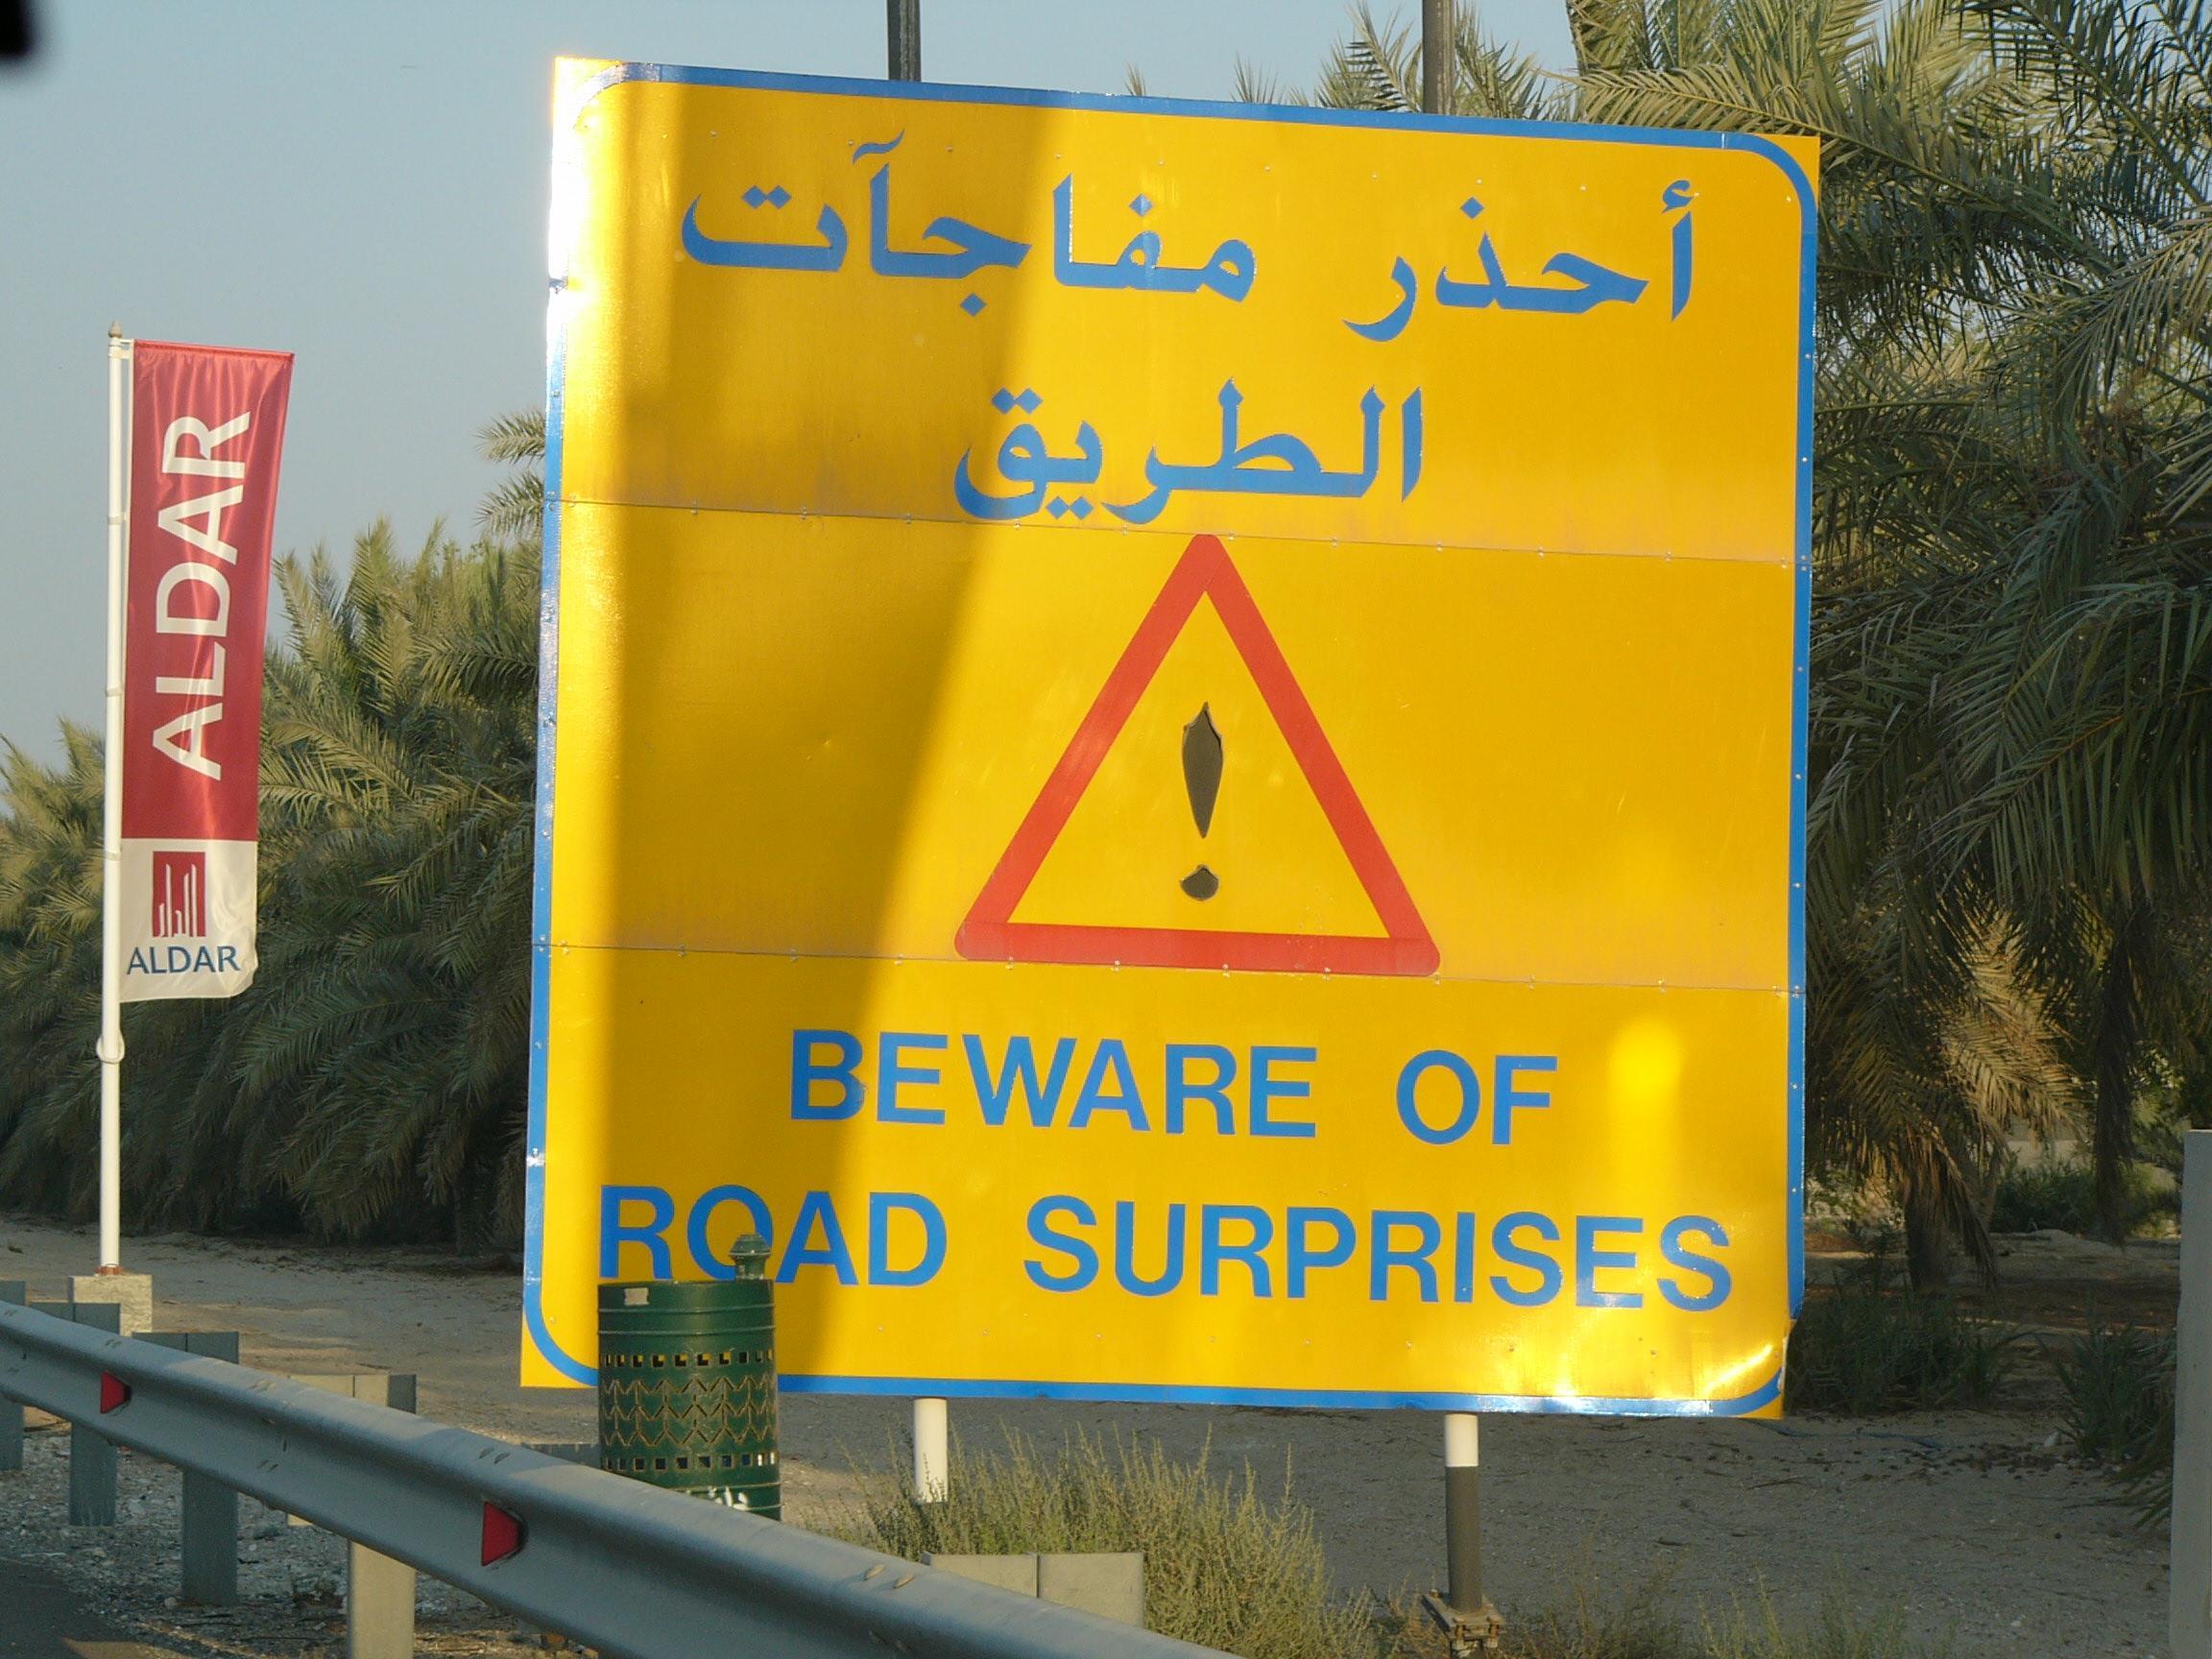 road surprises.jpg